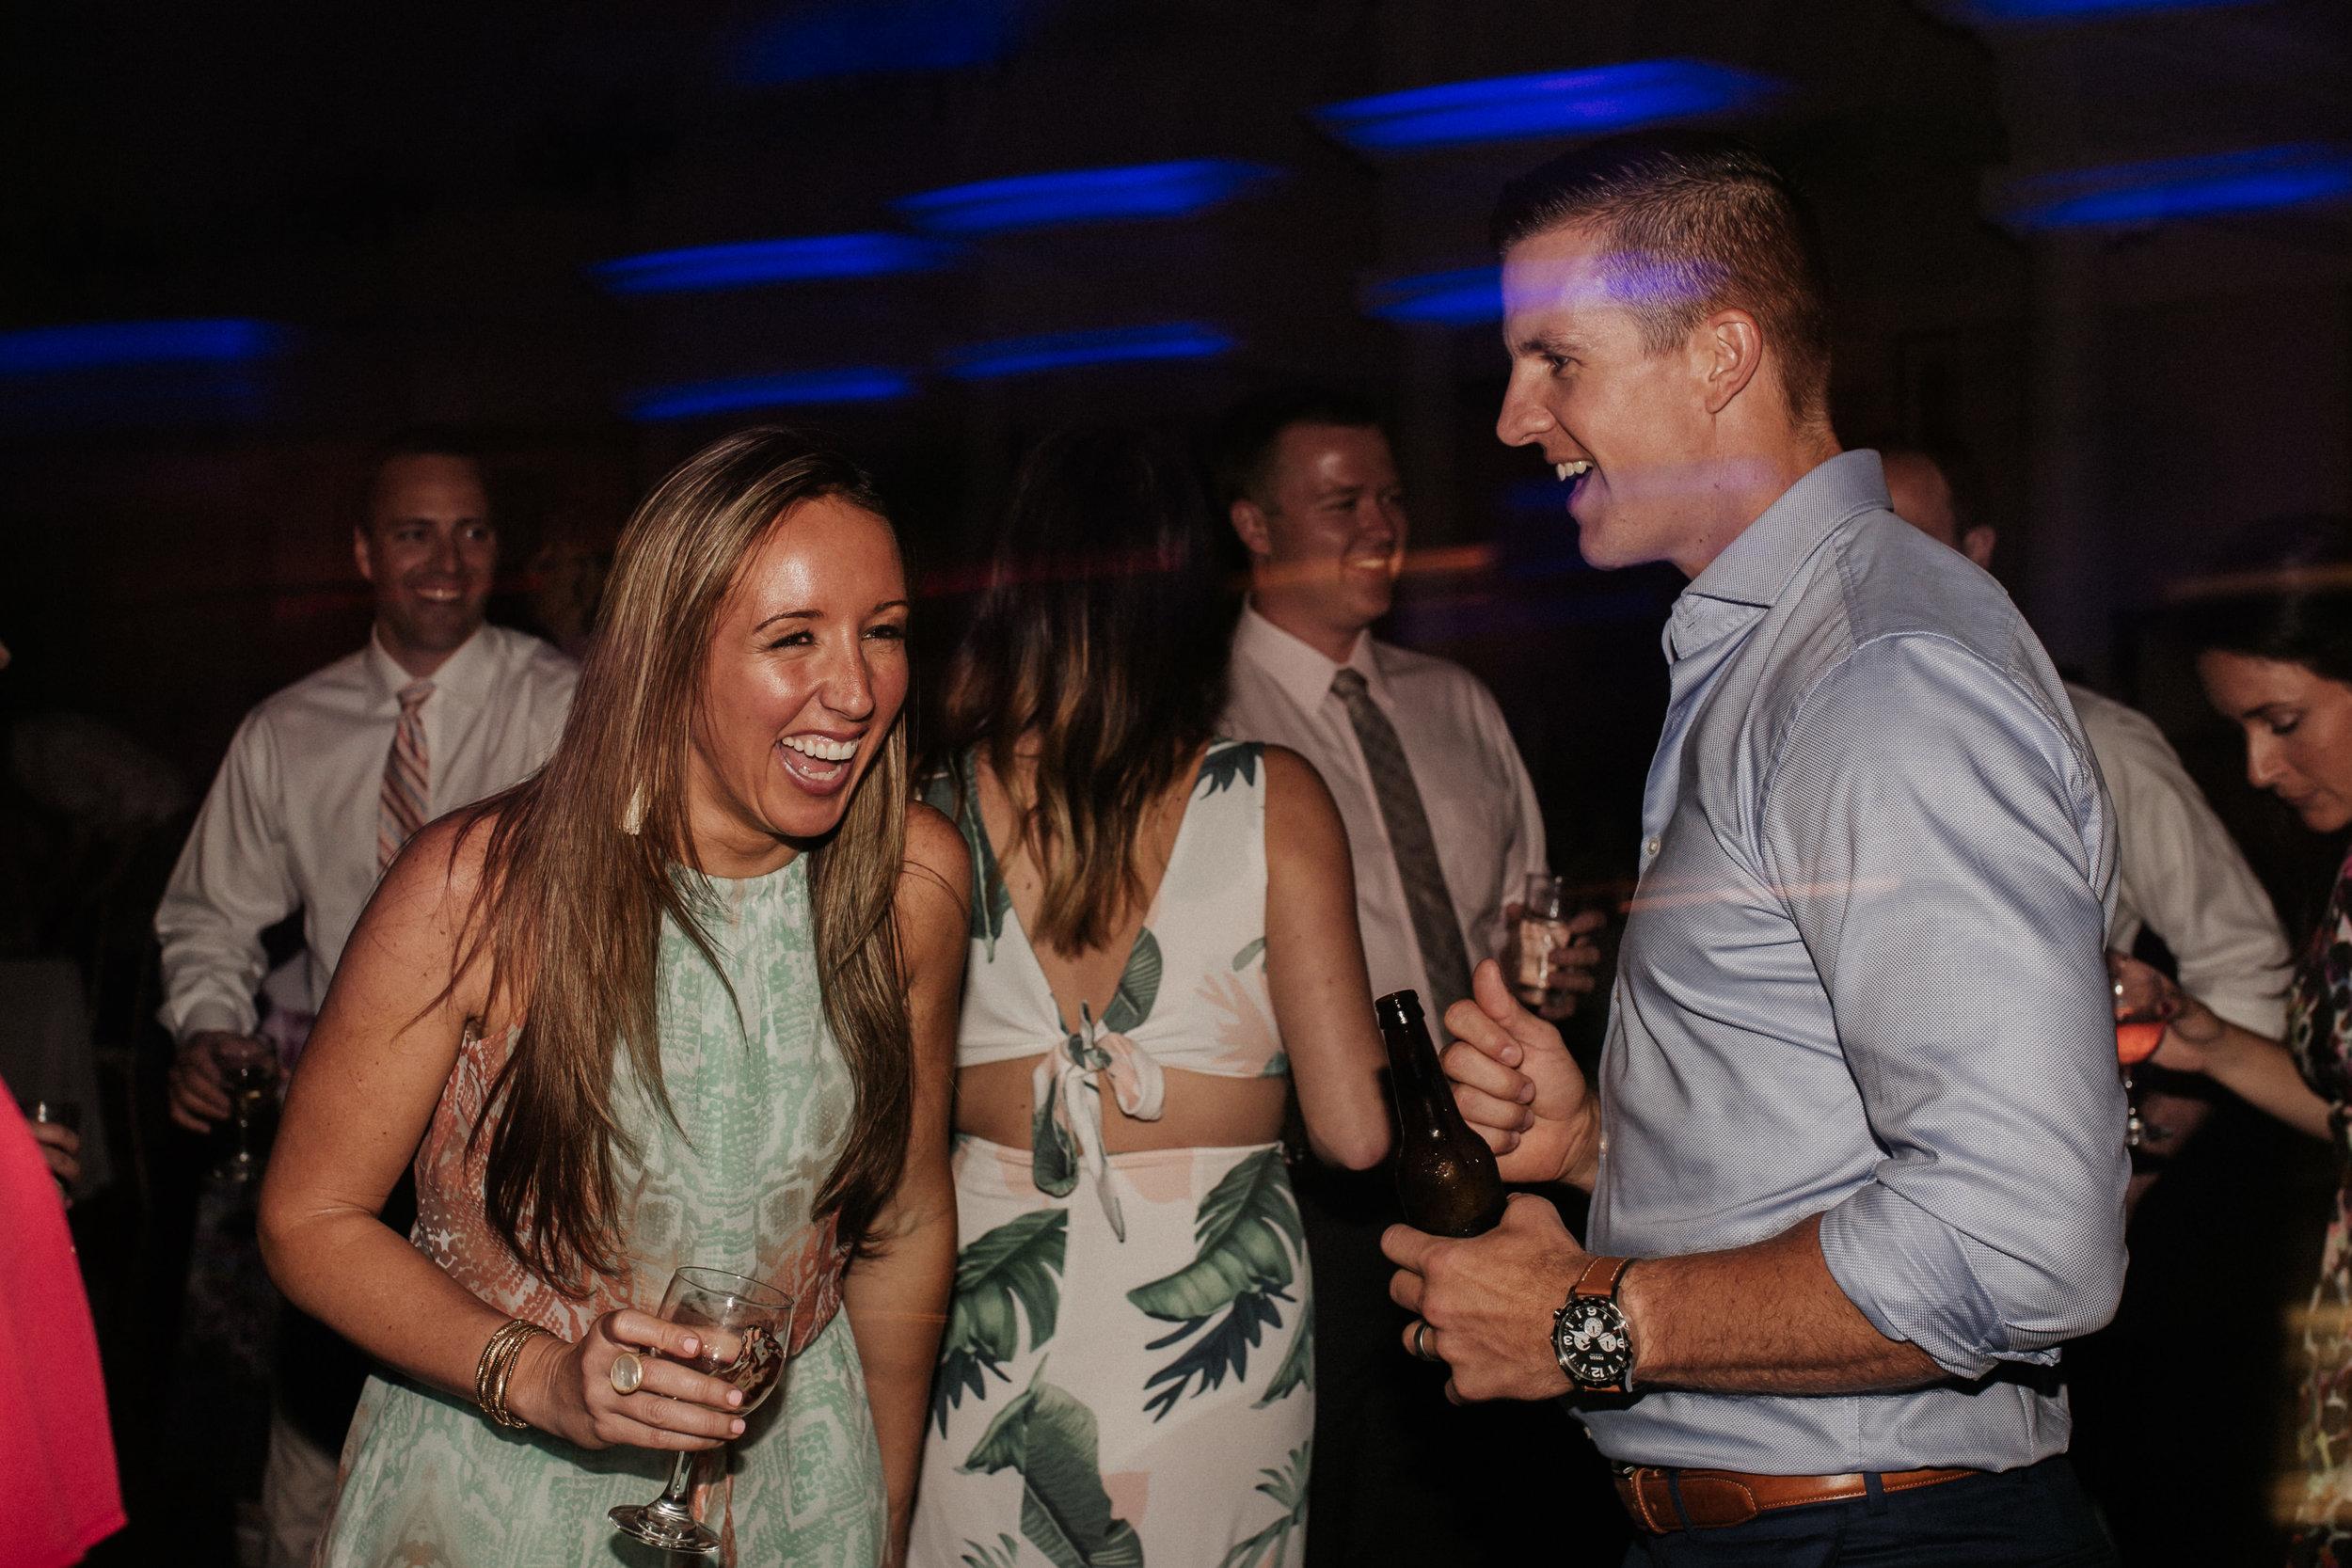 canfield_casino_wedding_087.JPG